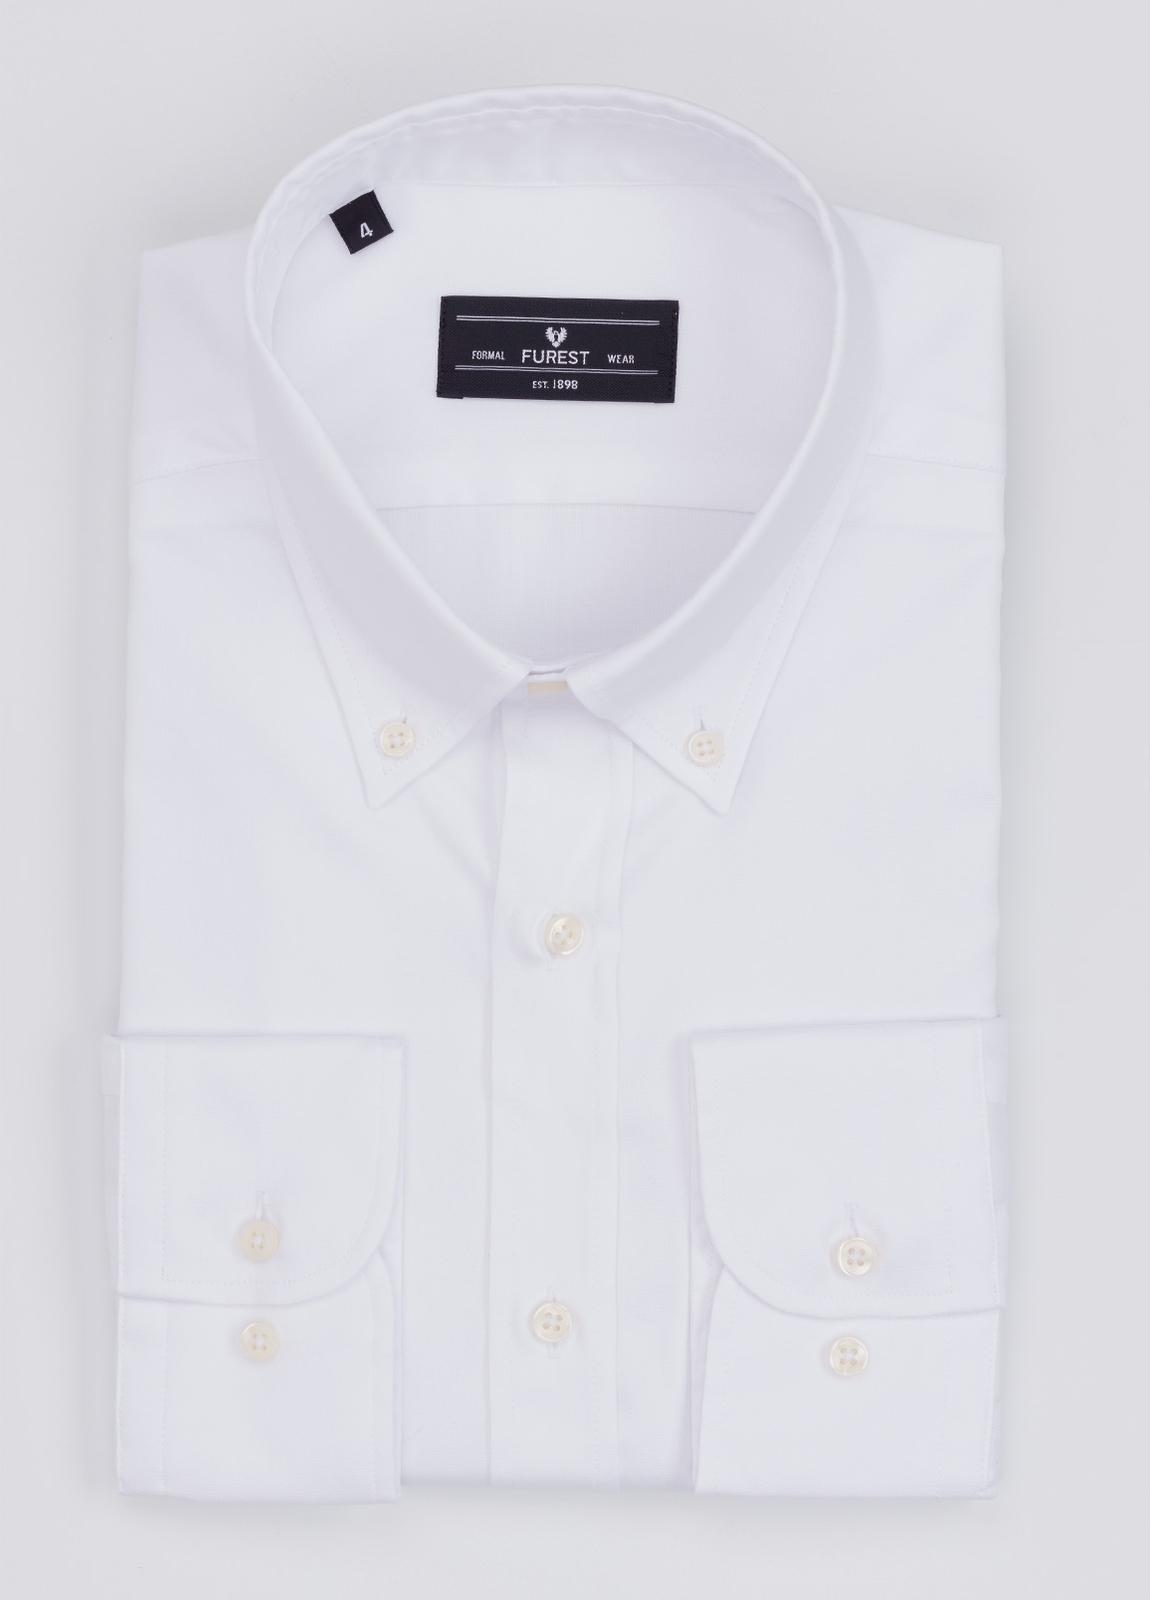 Camisa Formal Wear REGULAR FIT modelo BOTTON DOWN color blanco. 100% Algodón.